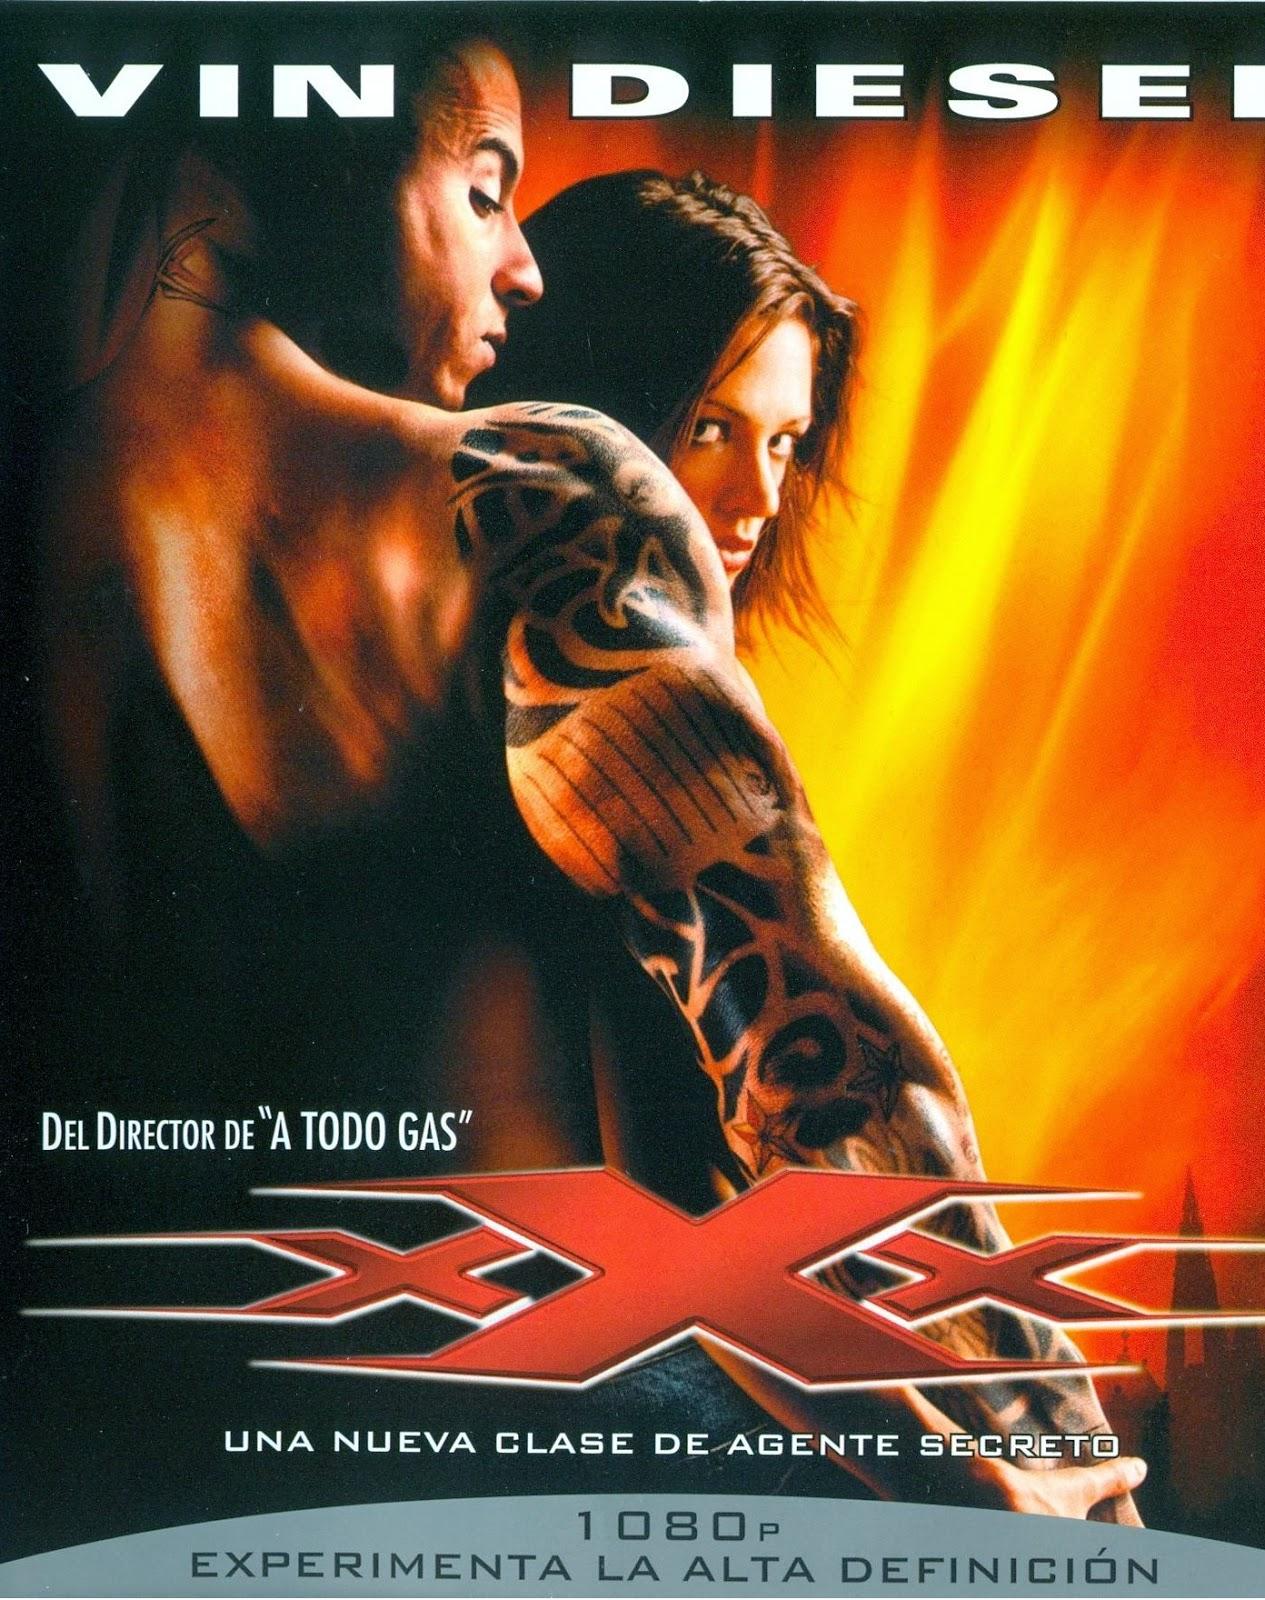 xxx (Triple x) (2002) BRRip HD VL Dual Lat-ing sub SH